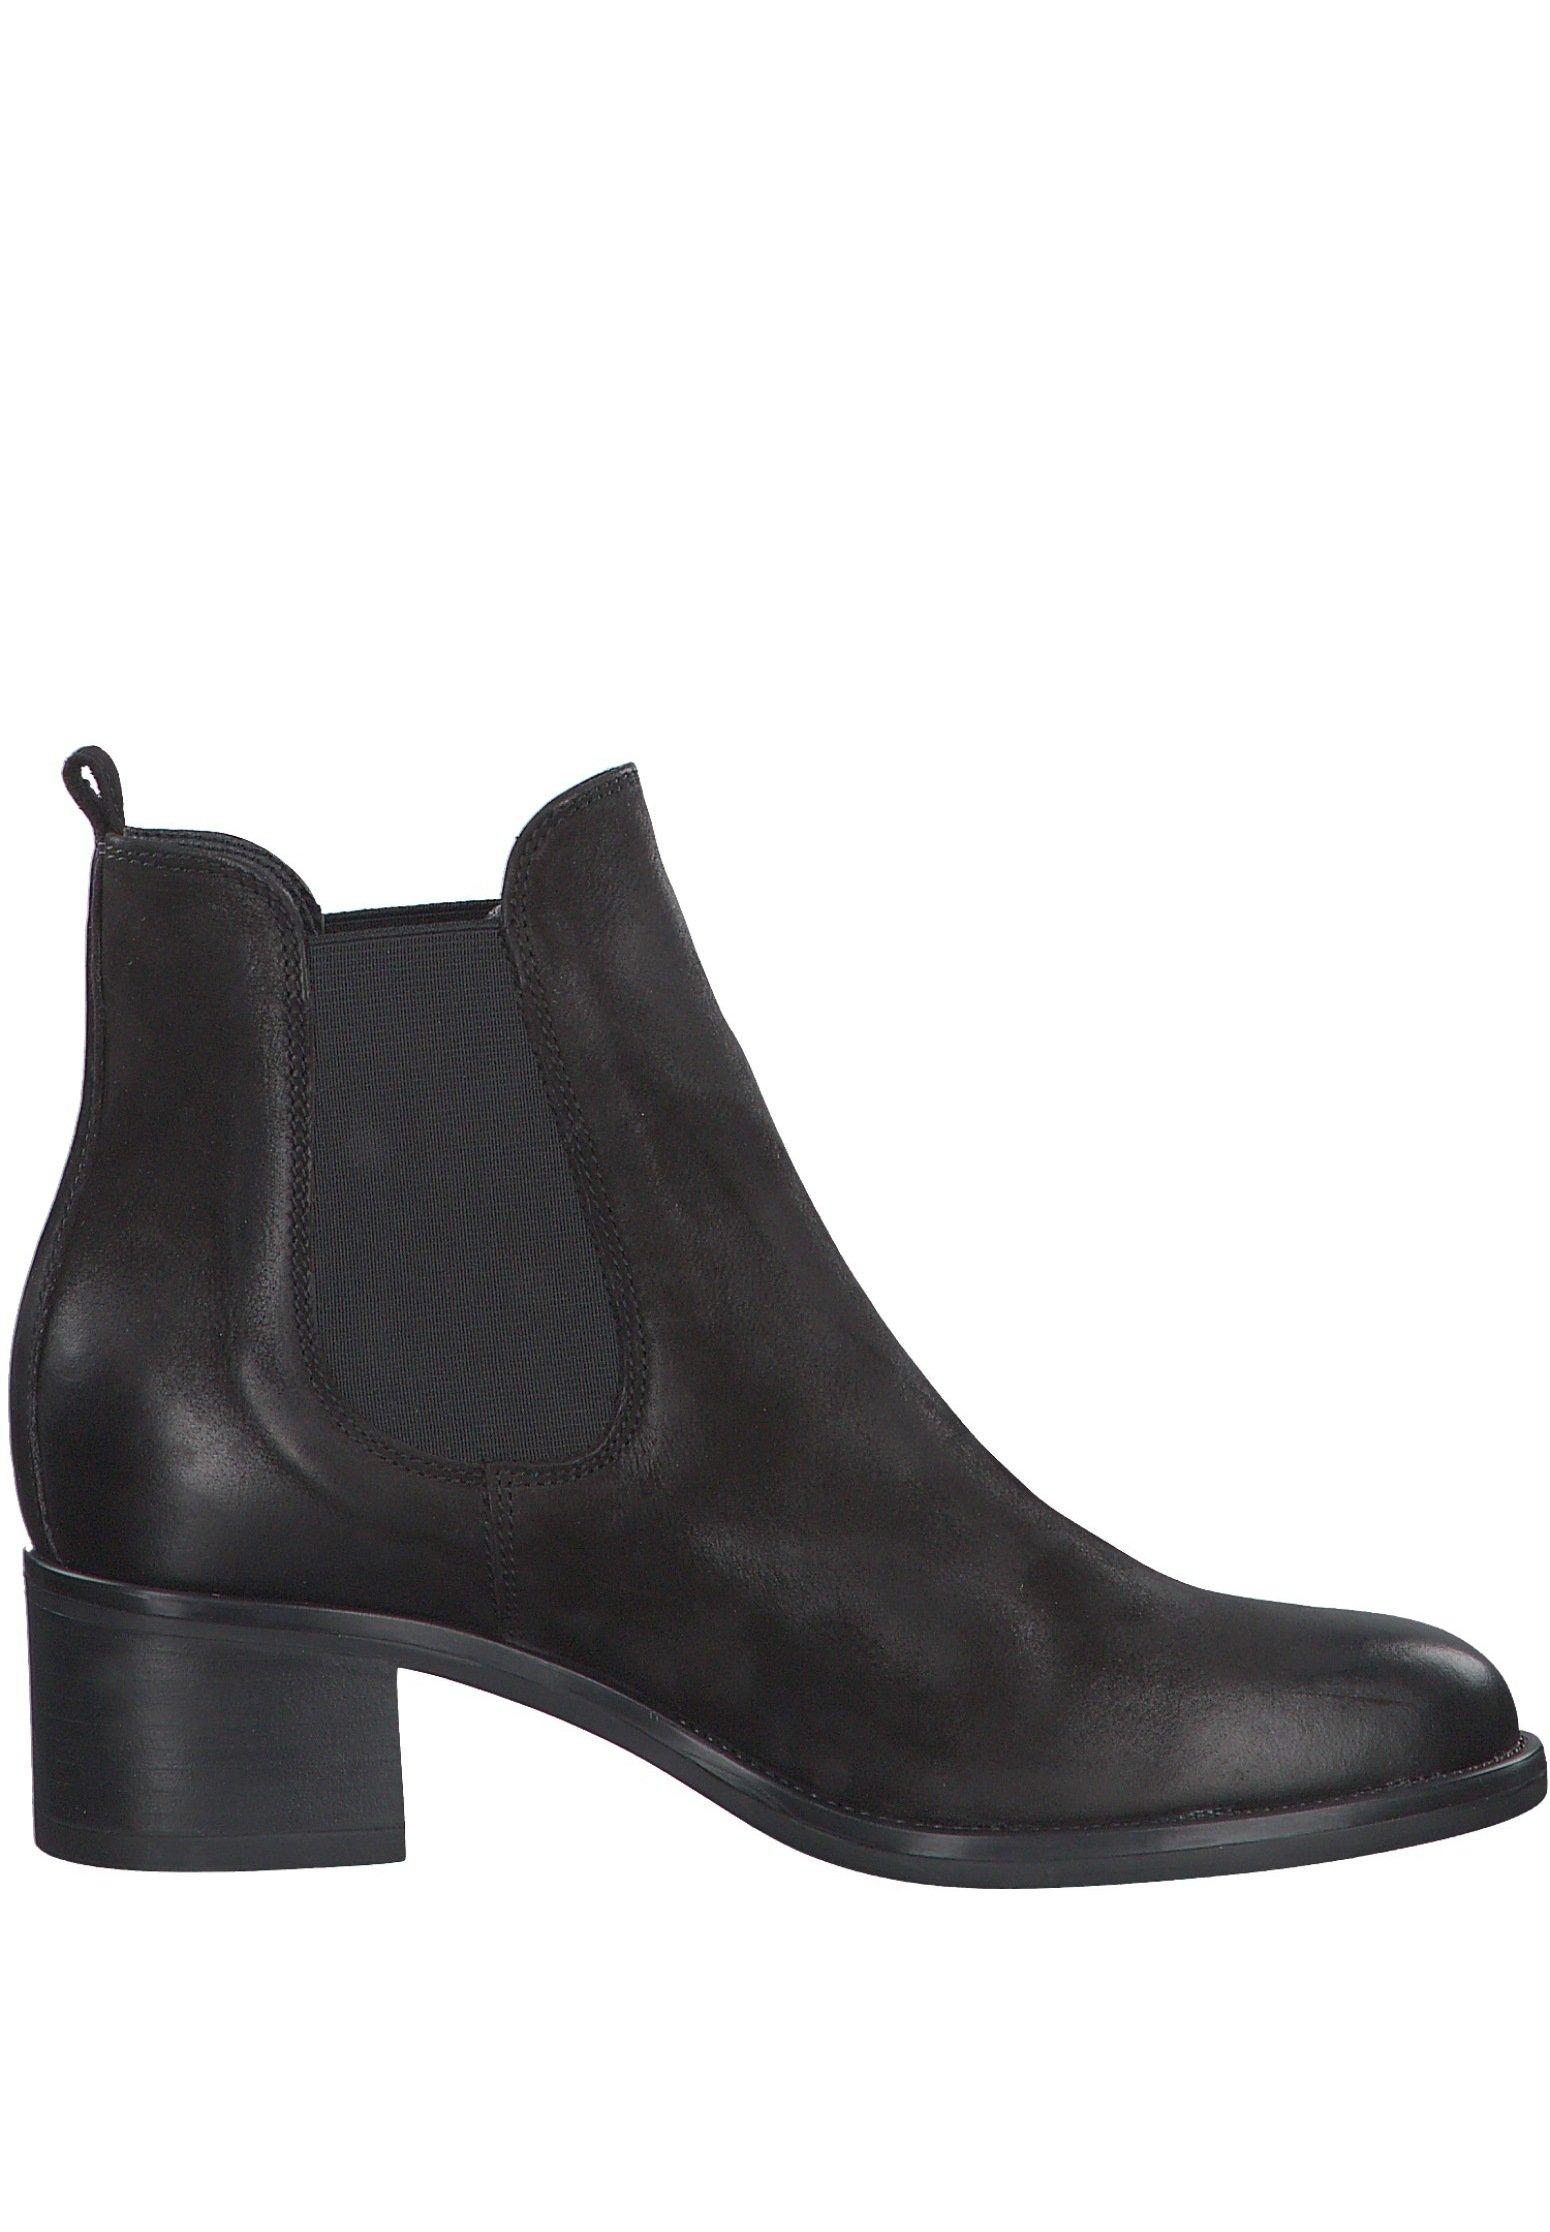 Tamaris Ankle Boot black nubuc/schwarz